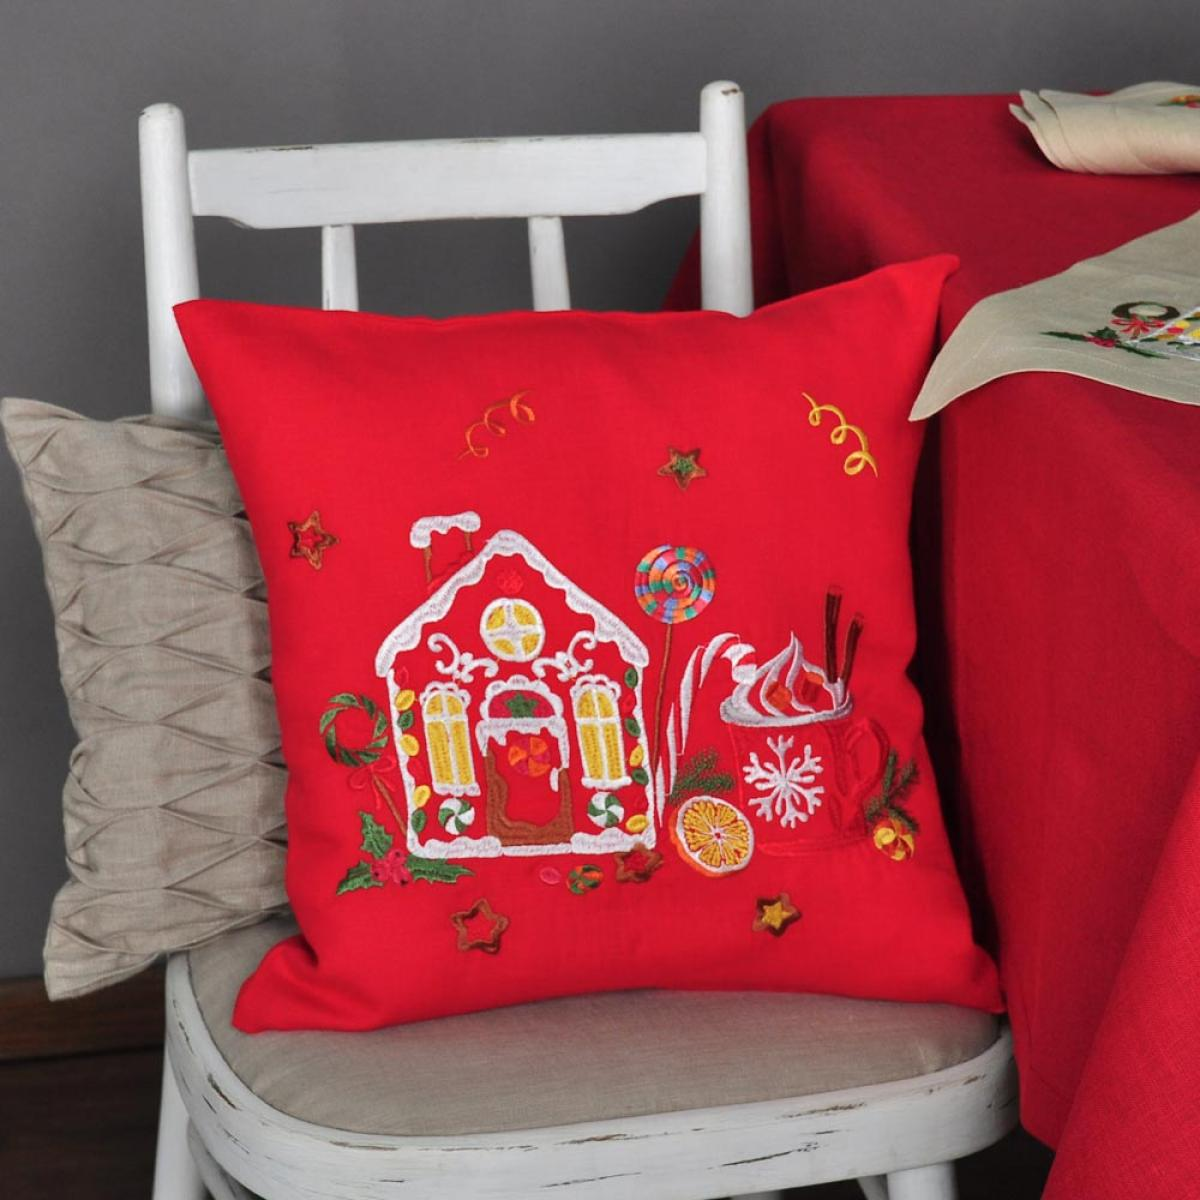 Pillowcase with embroidery Taste of Christmas 40 * 40. Photo №1. | Narodnyi dim Ukraine